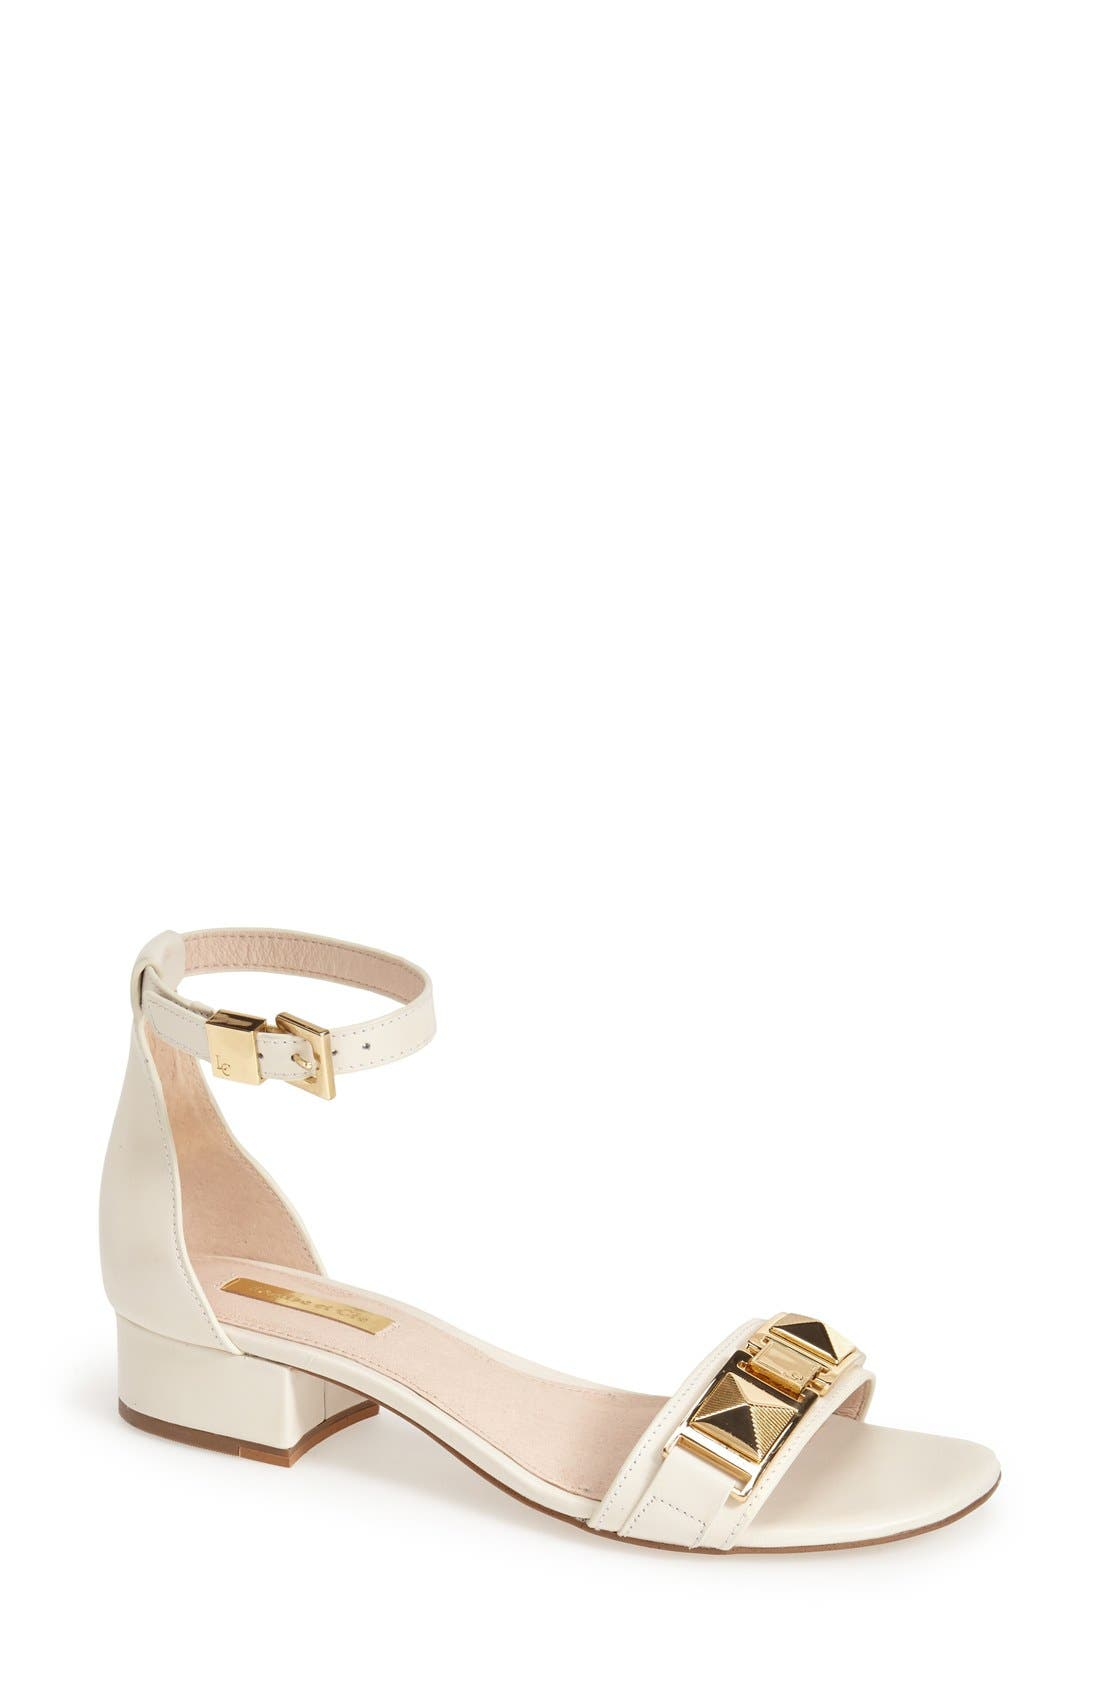 Alternate Image 1 Selected - Louise et Cie 'Isabelle' Ankle Strap Sandal (Women)